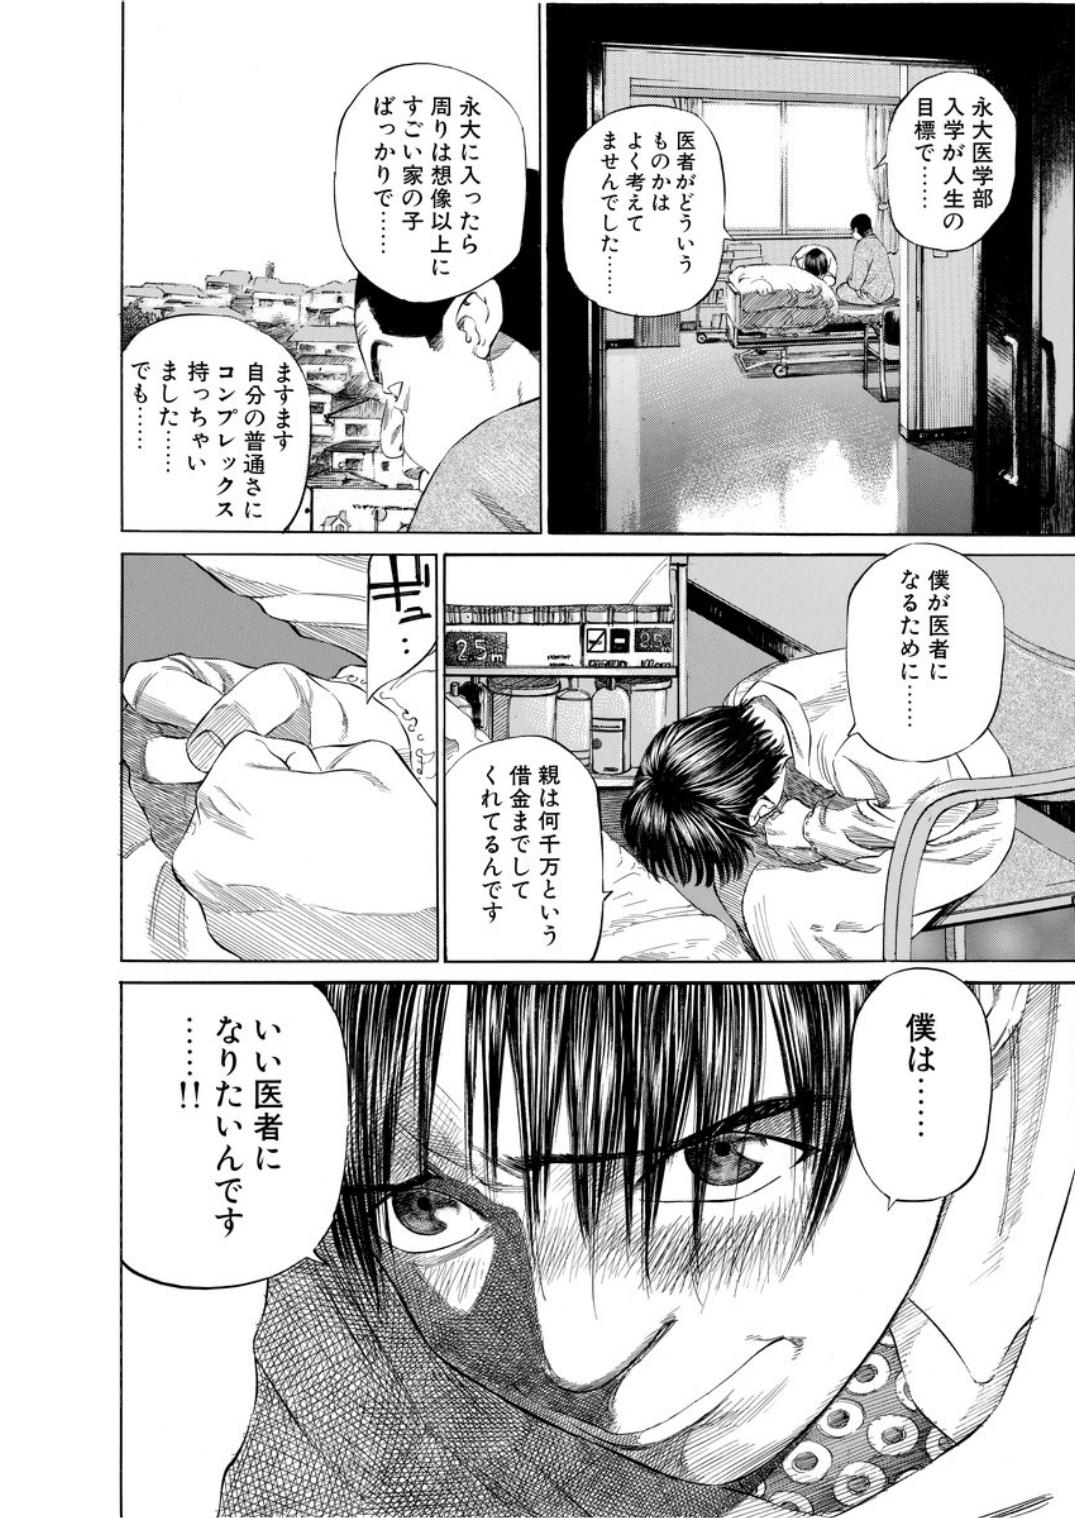 001bj_page-0182.jpg